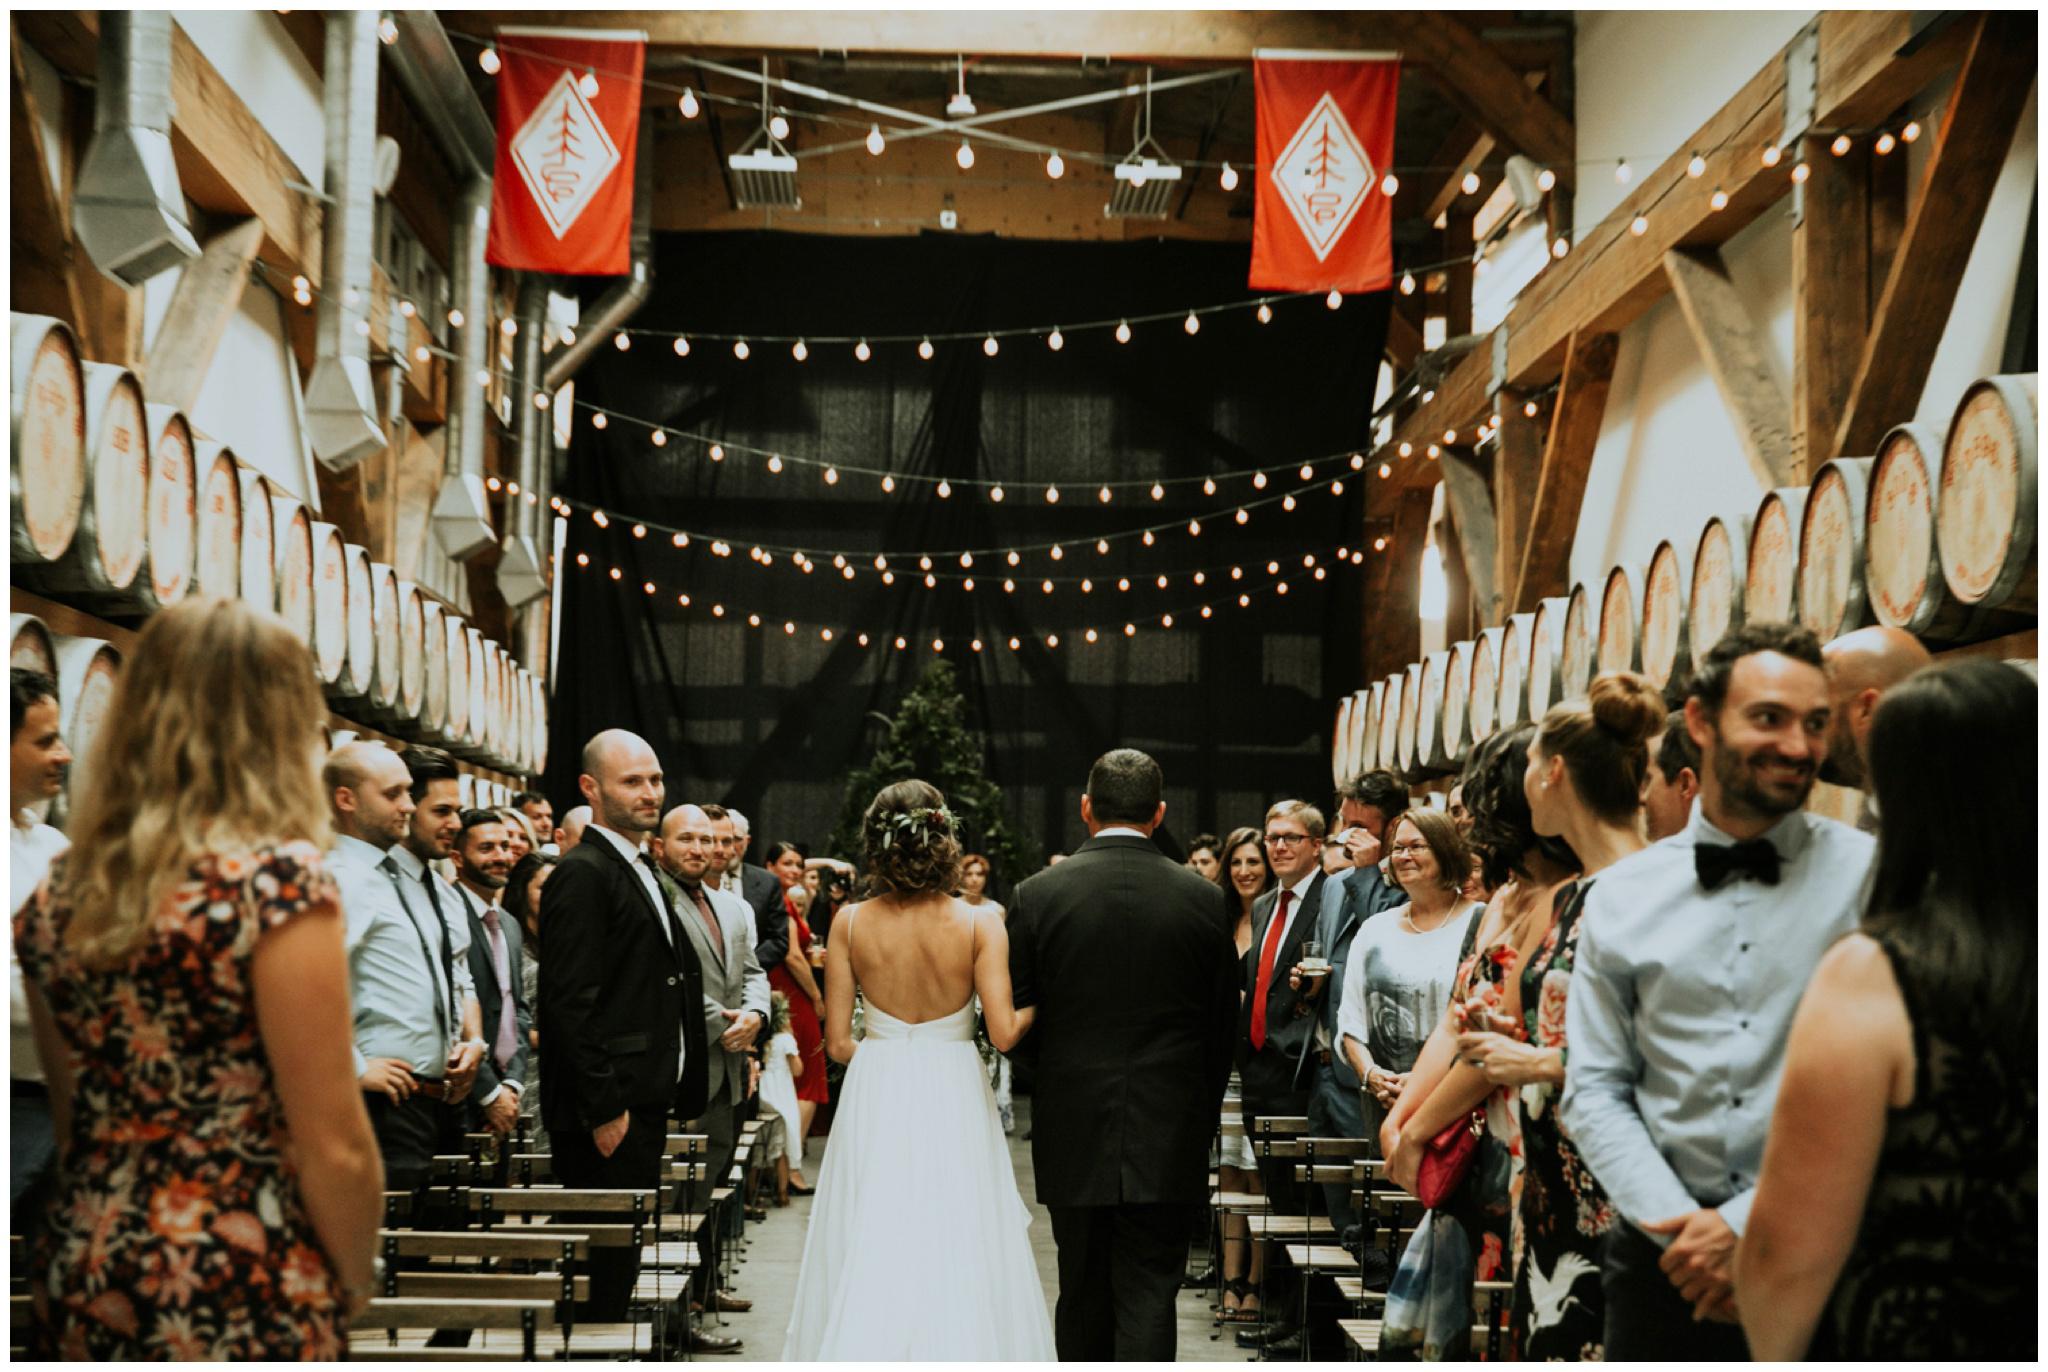 alyssa-keiran-westland-distillery-urban-seattle-wedding-photographer-caitlyn-nikula-15.jpg